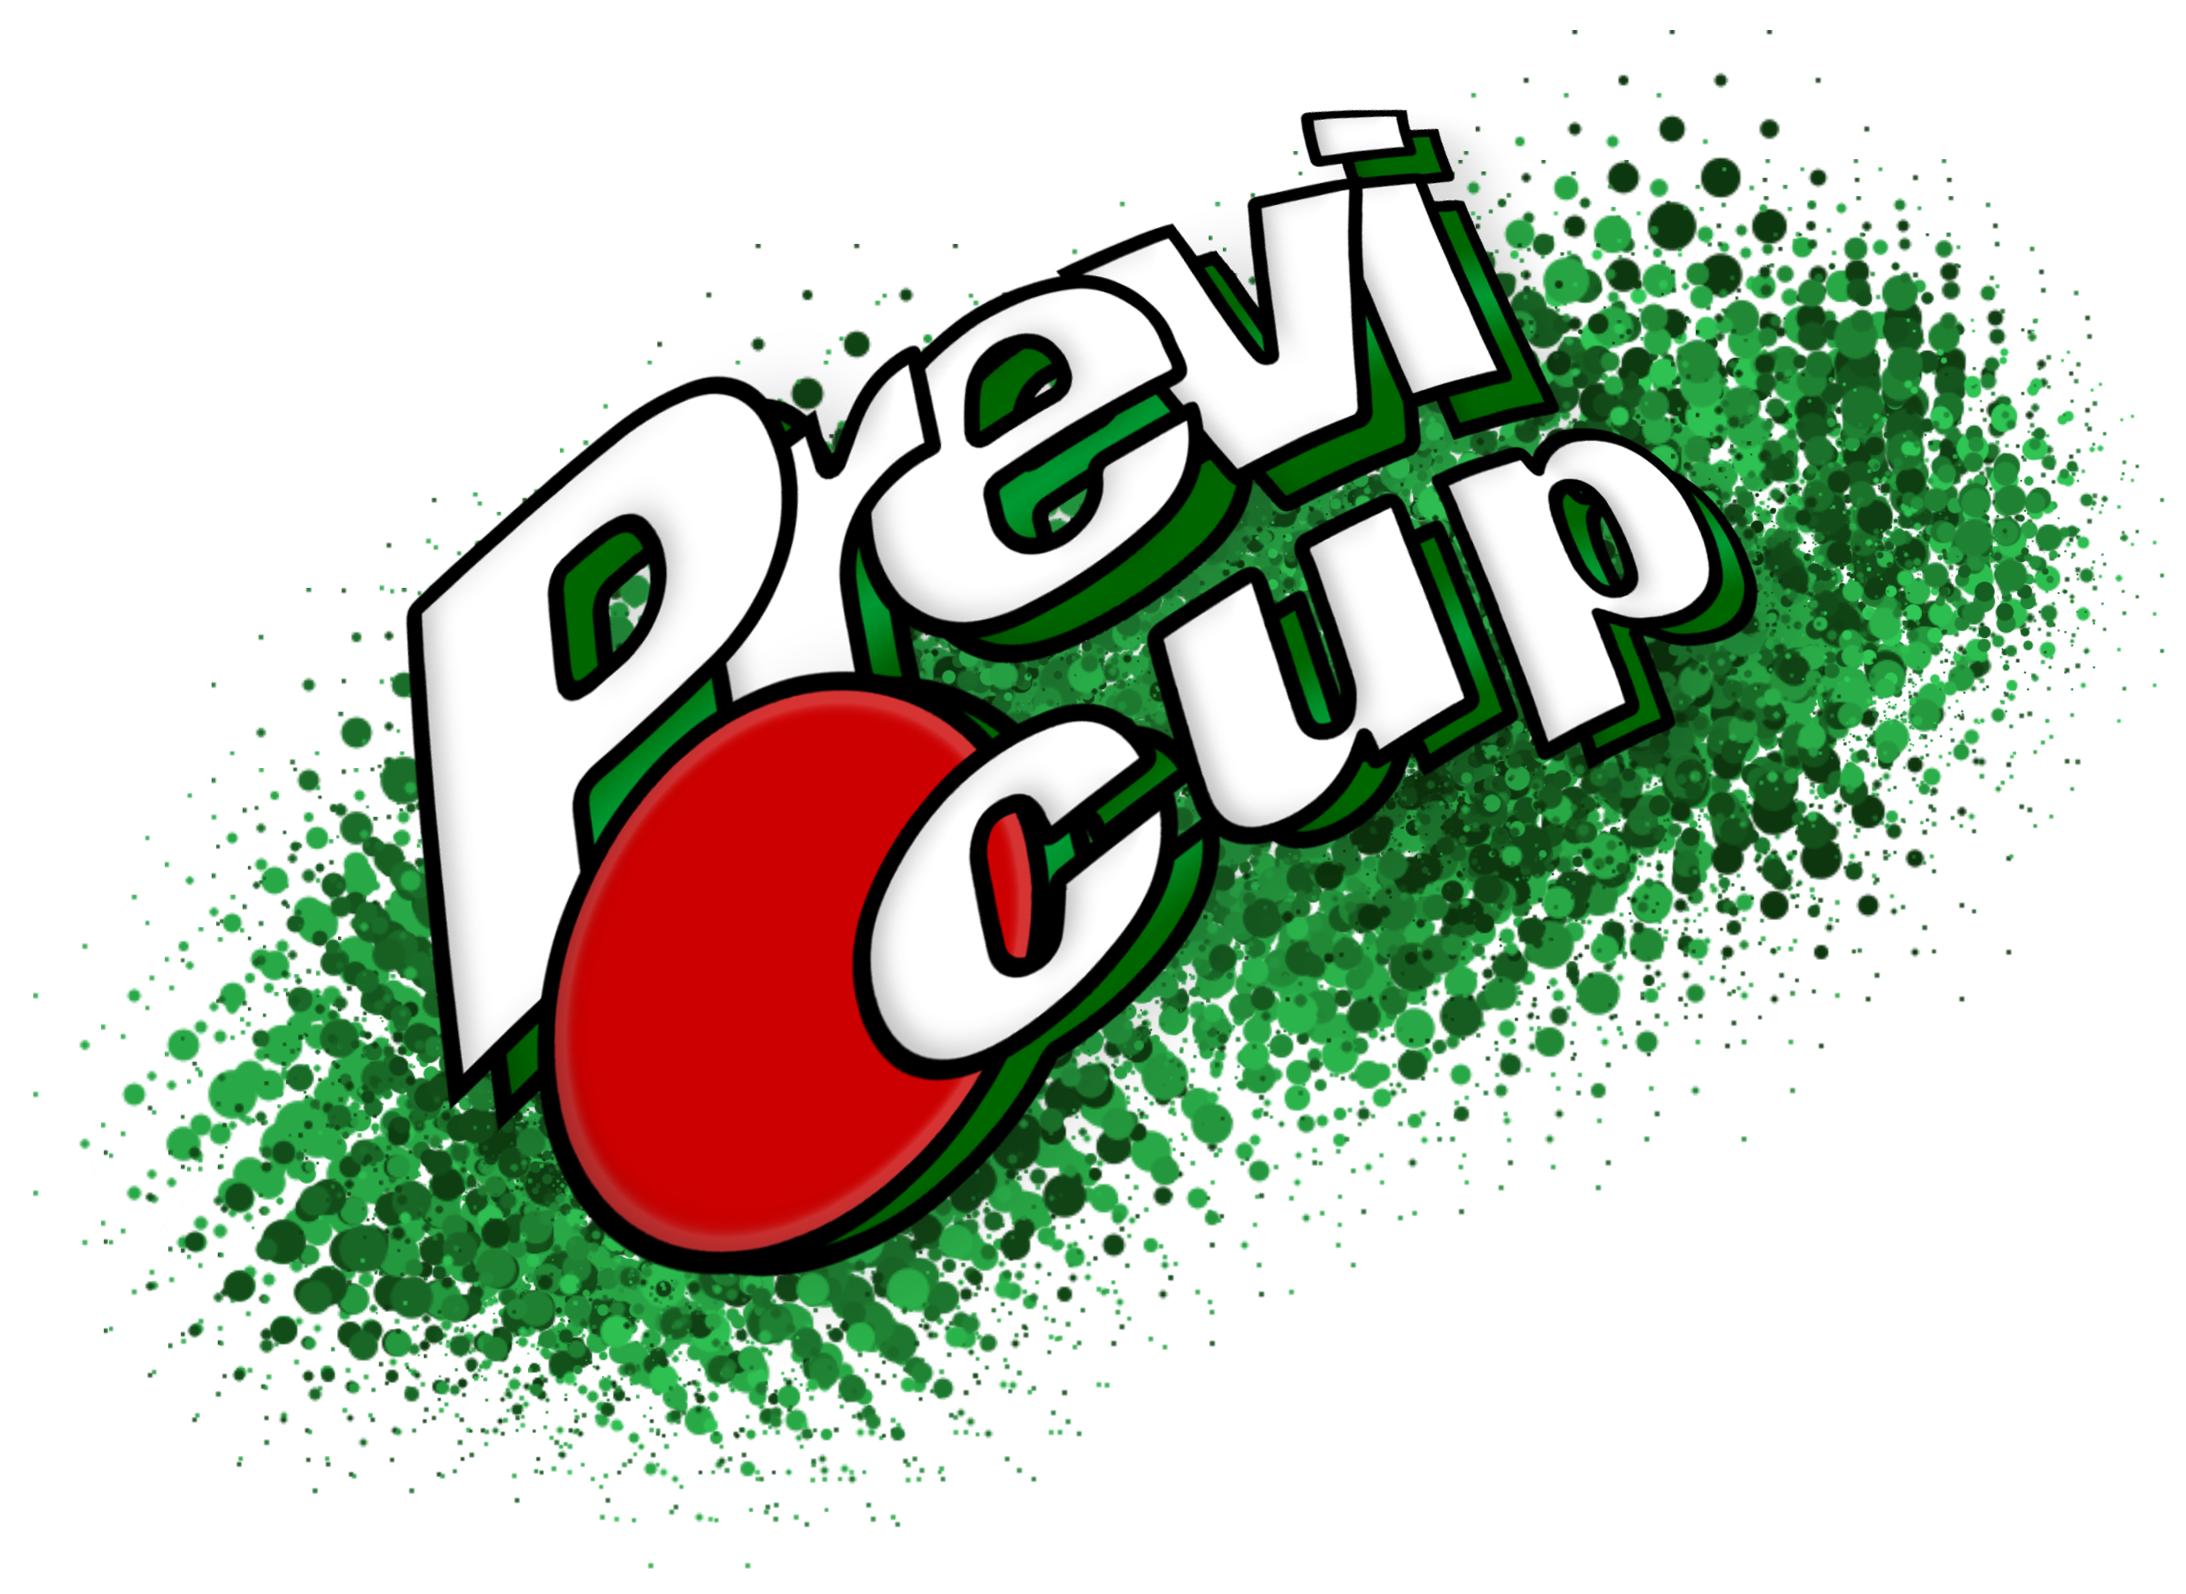 Previ cup ' sfondo trasparente.png